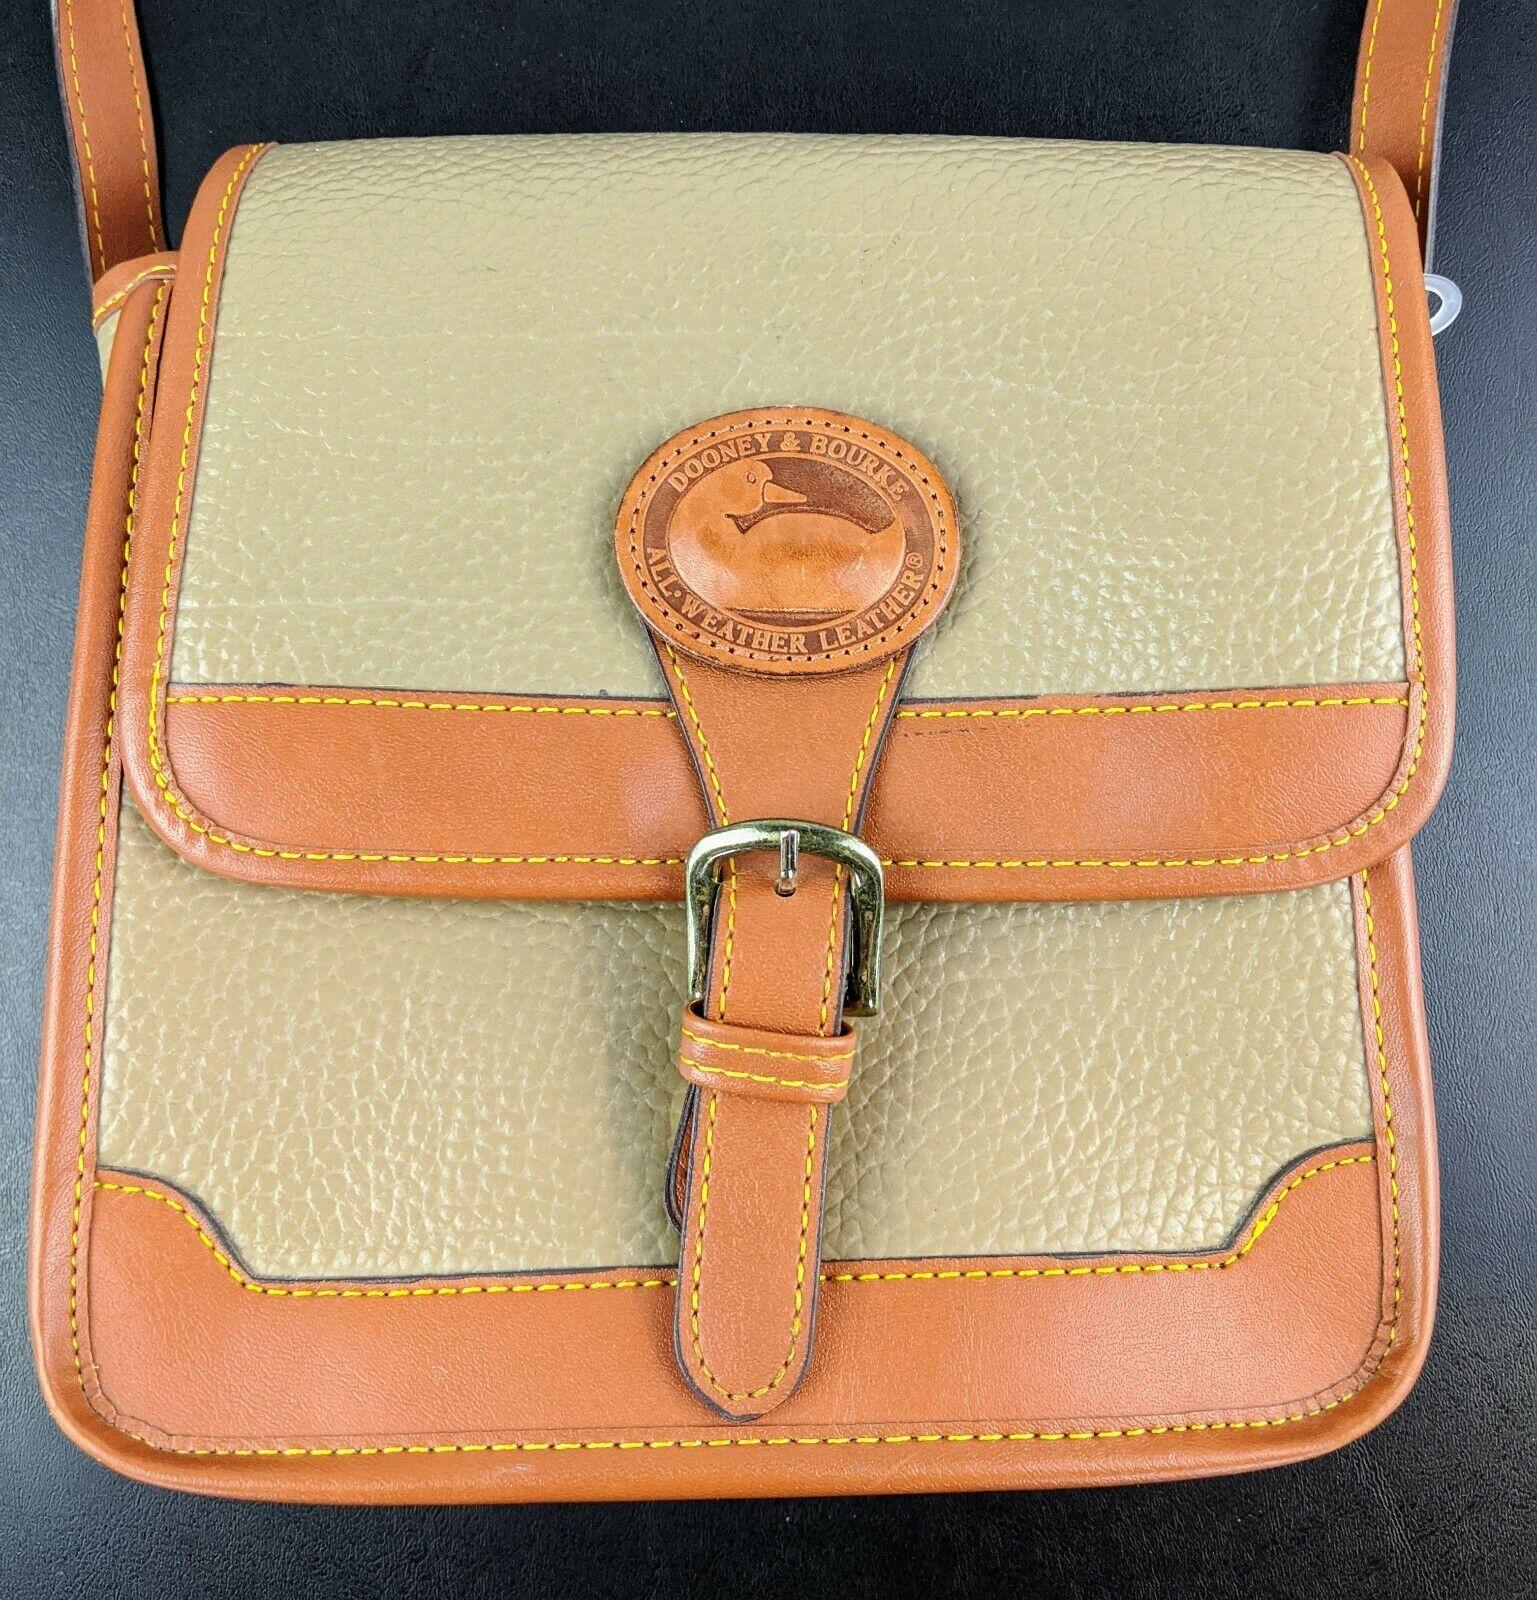 Dooney & Bourke Tan Brown Small Purse Handbag Tra… - image 2